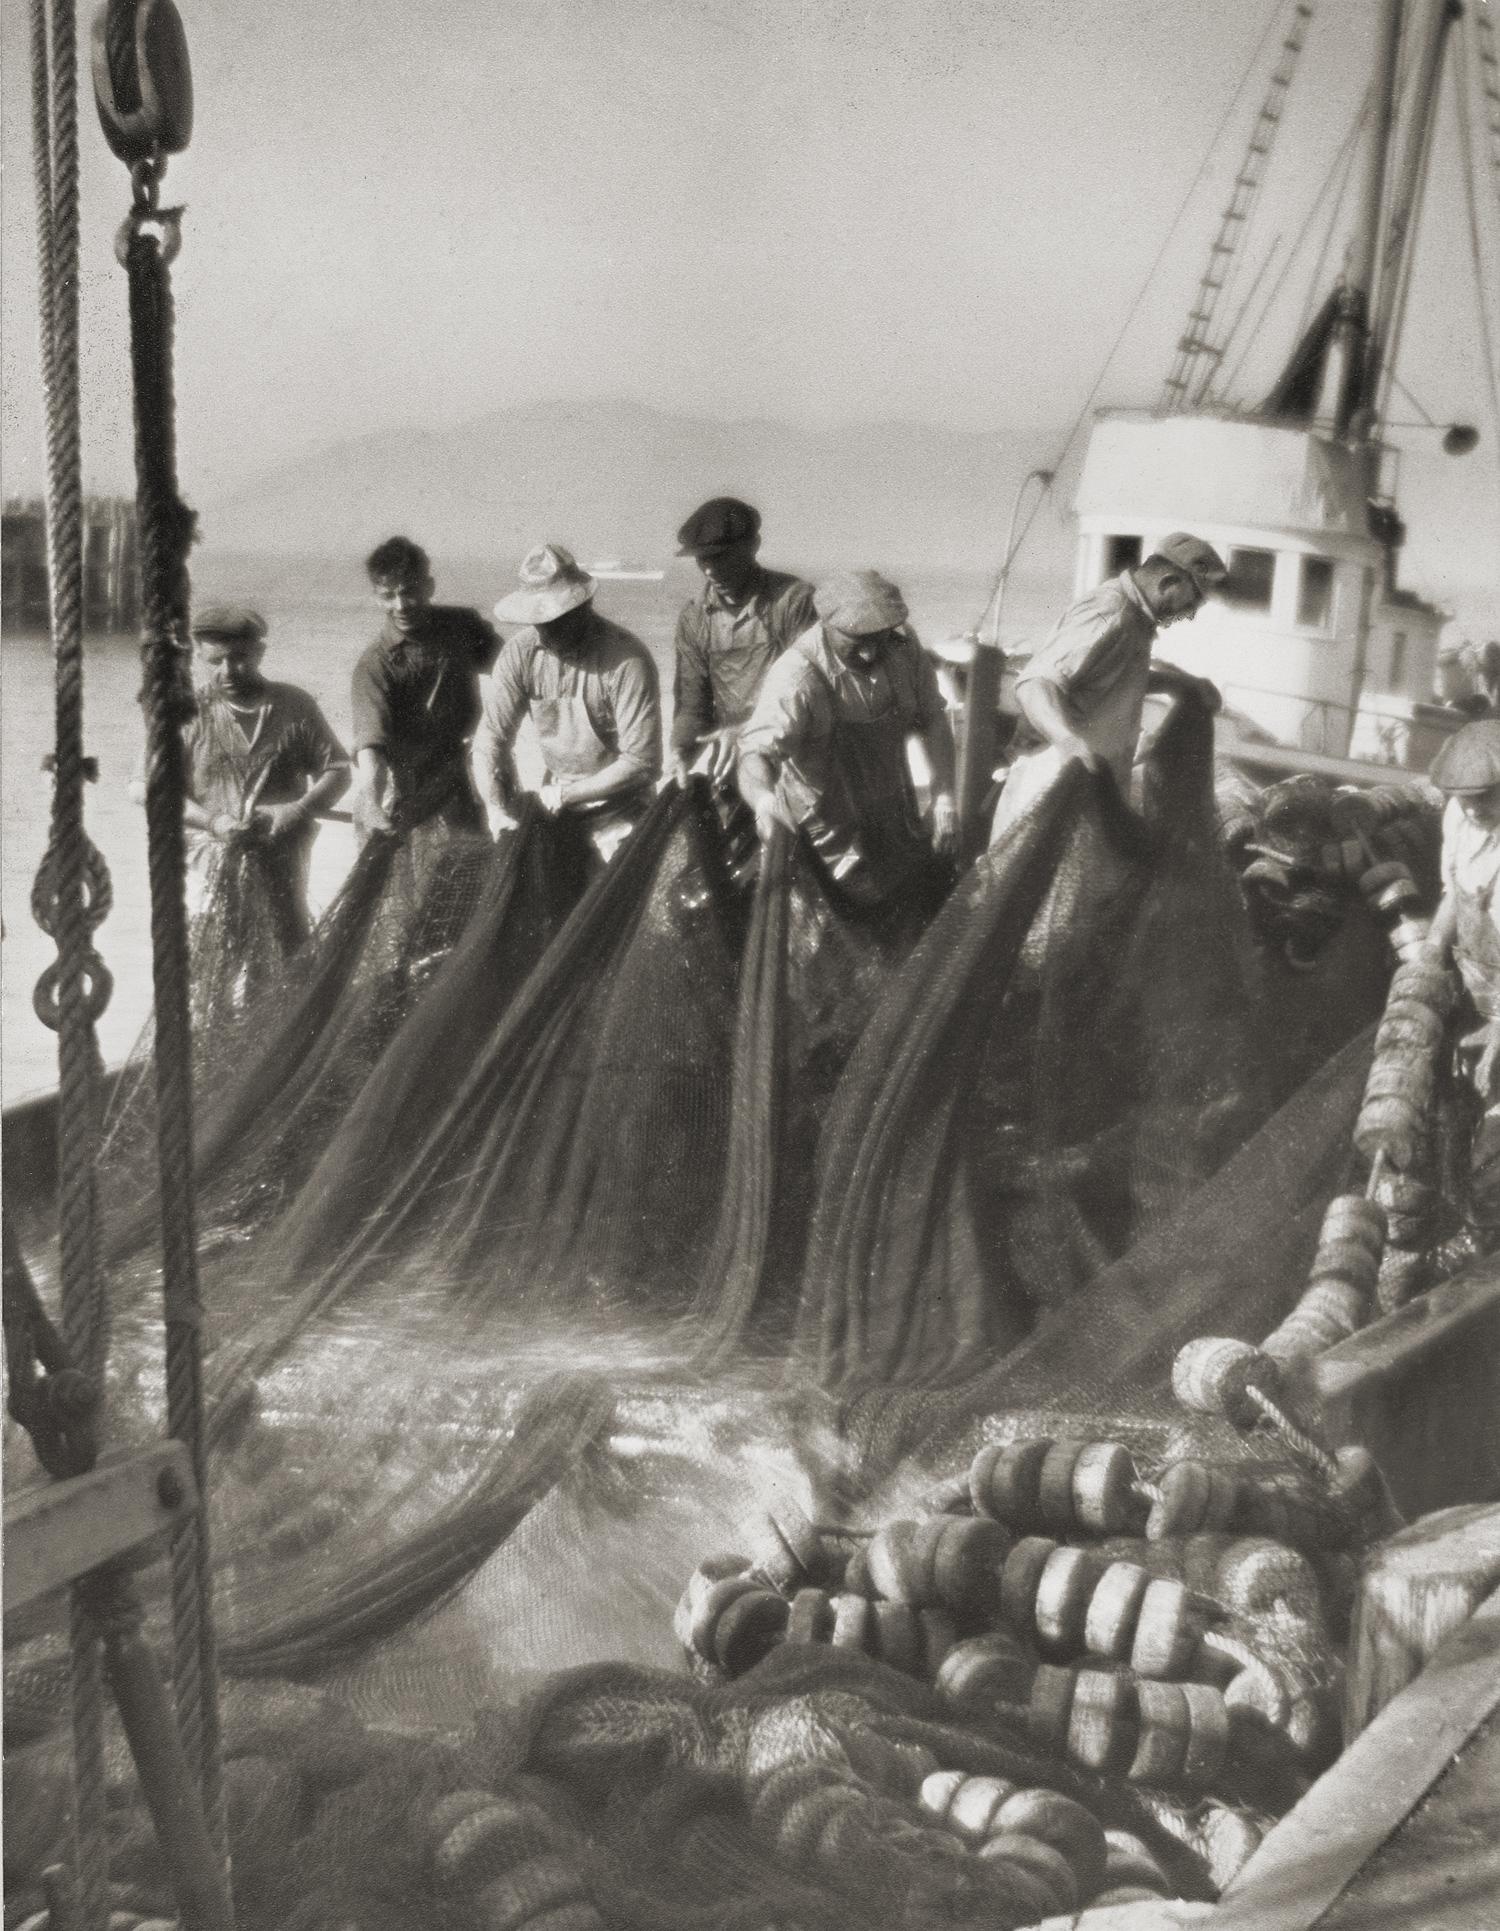 Washing their nets at Fisherman's Wharf